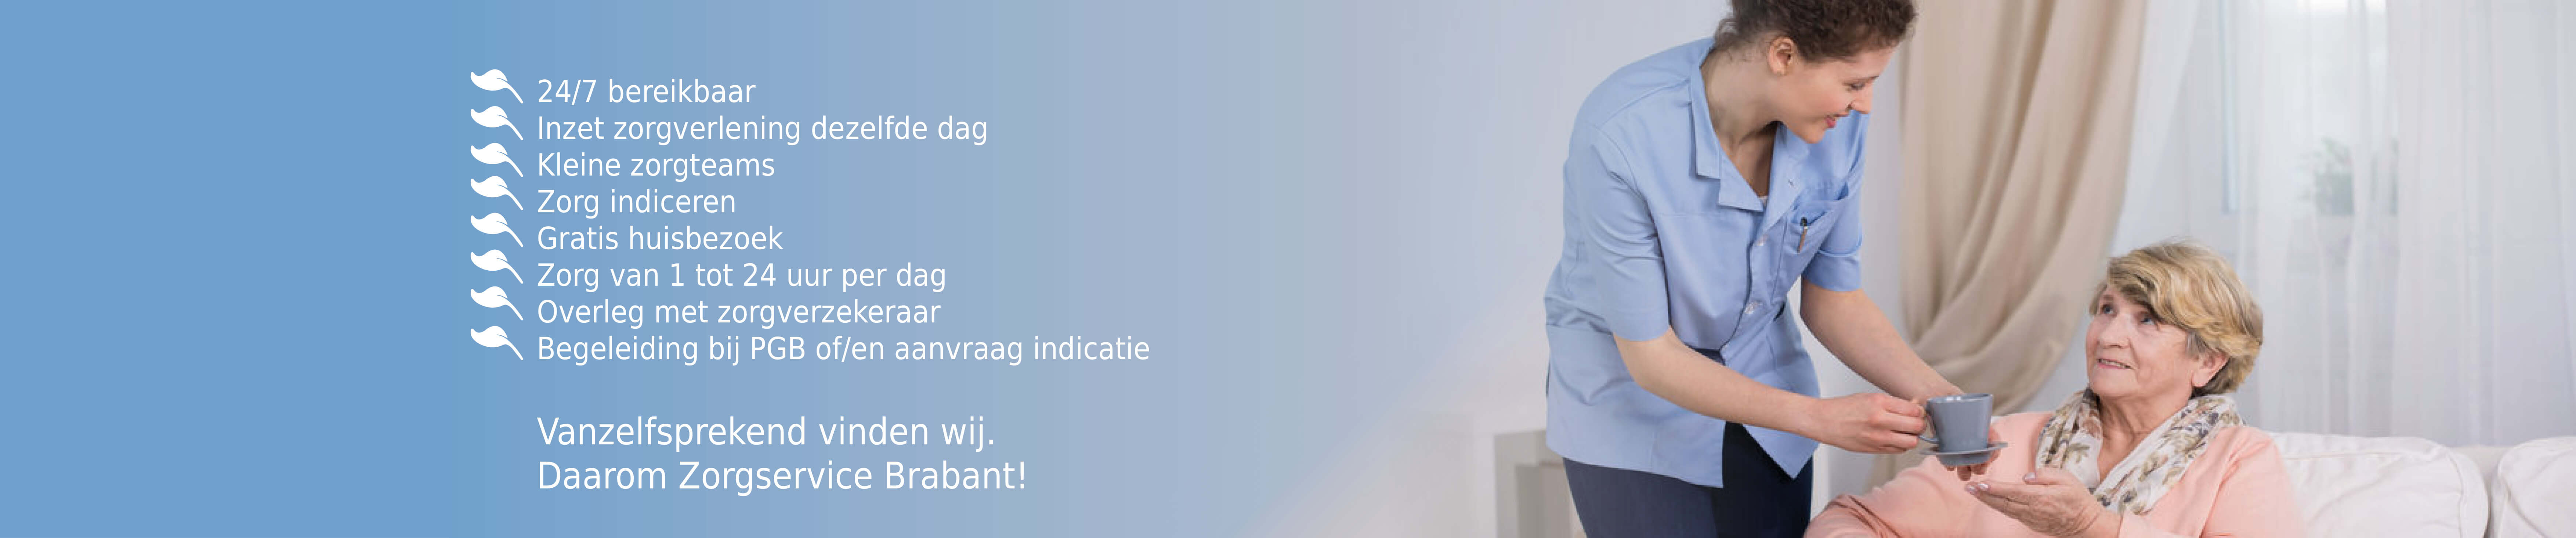 Zorgservice Brabant website